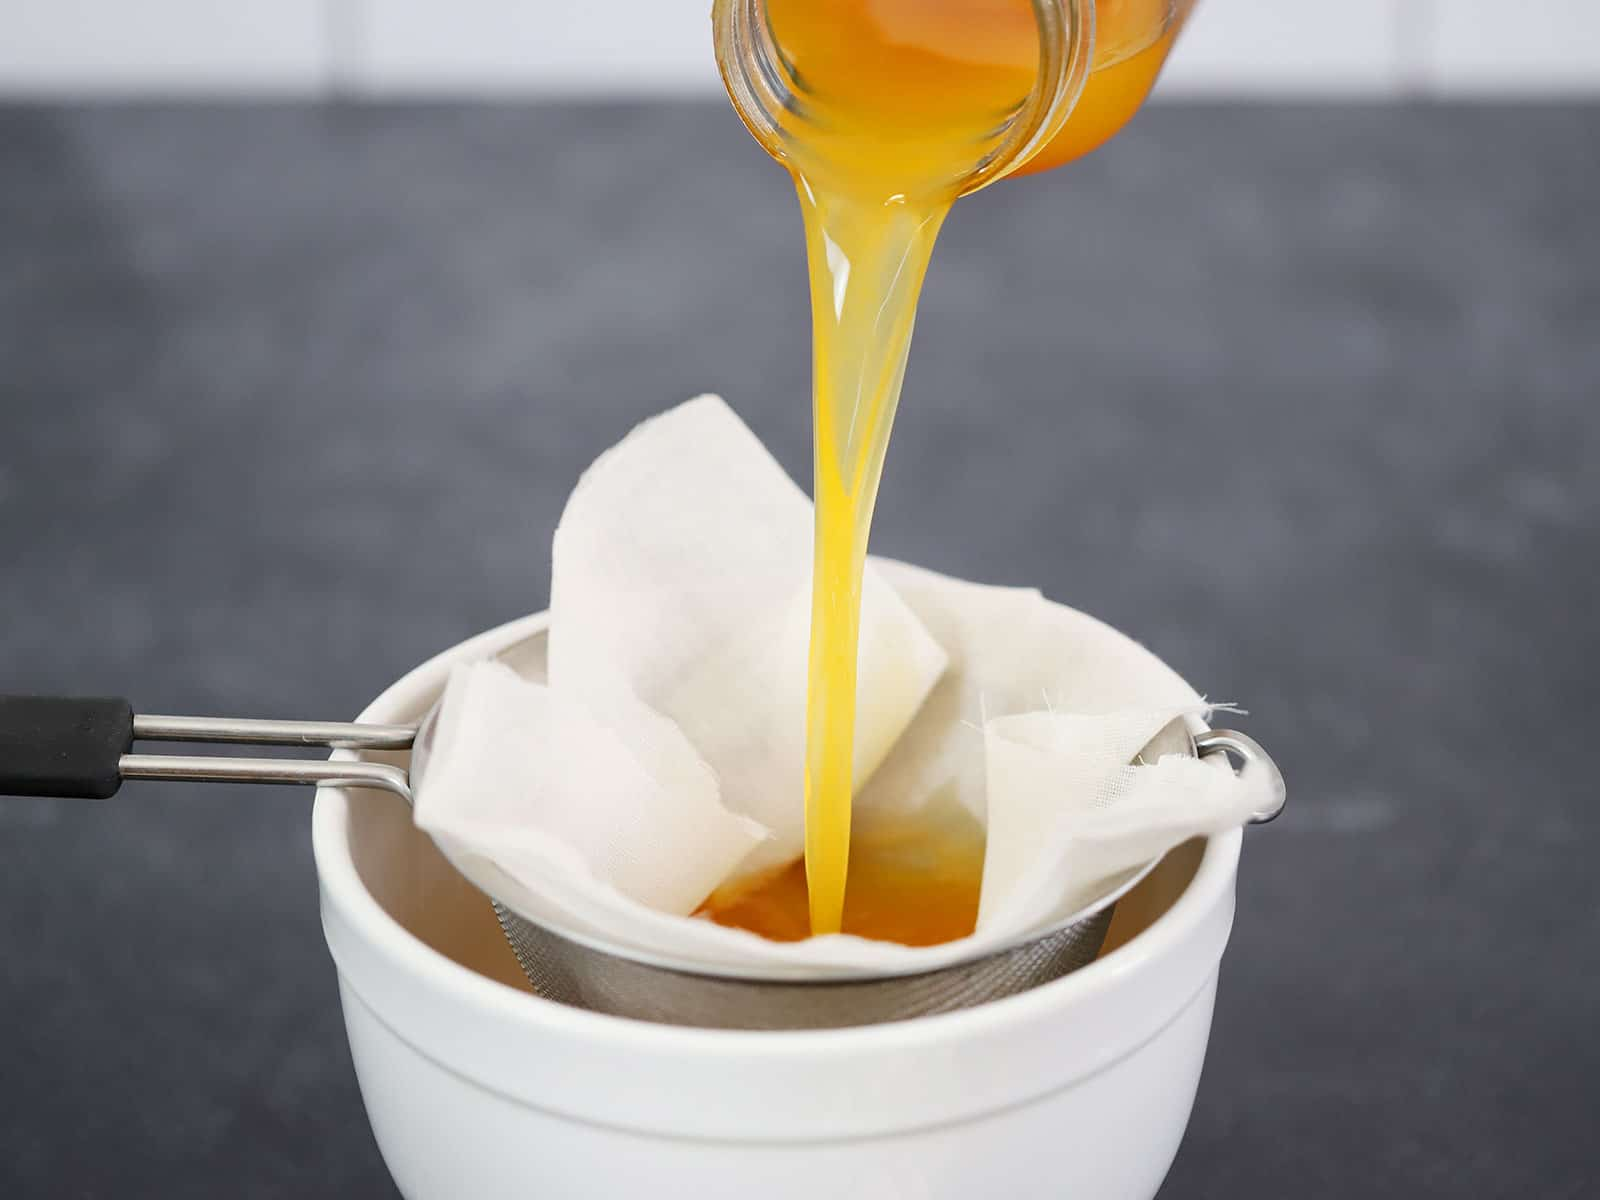 Pouring pumpkin vodka through cheesecloth